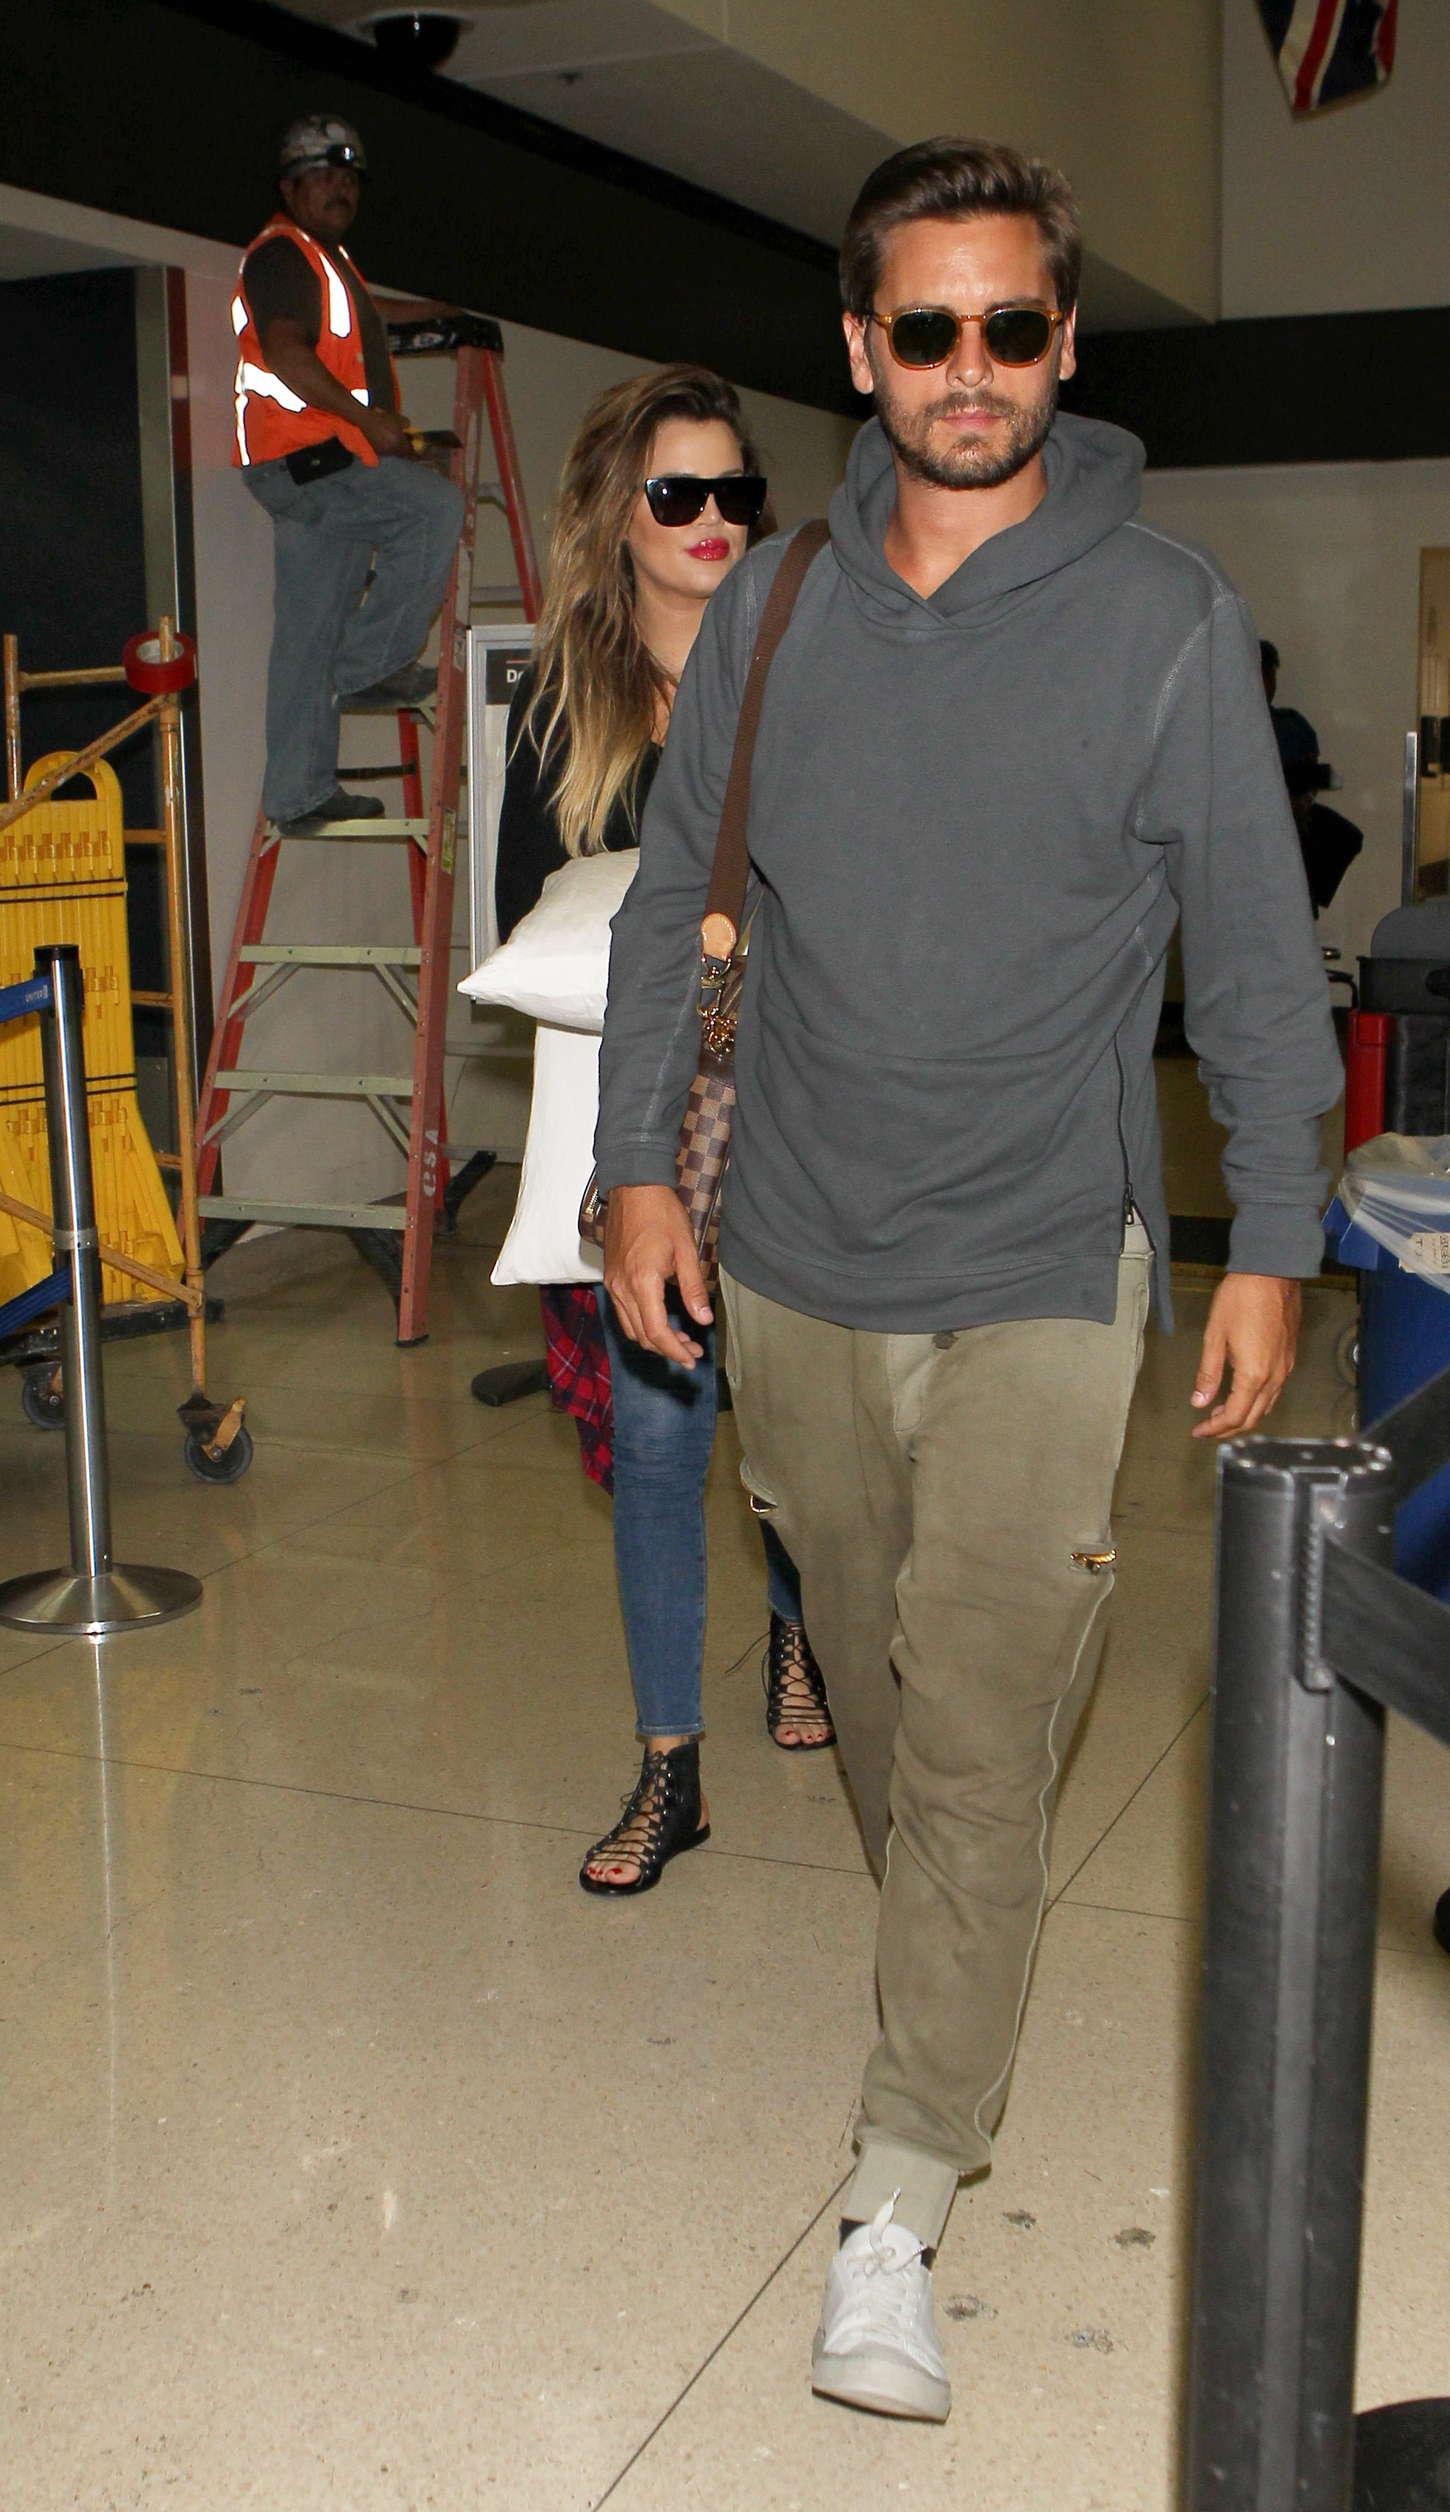 Khloe Kardashian 2014 : Khloe Kardashian with Scott Disick at LAX airport -18